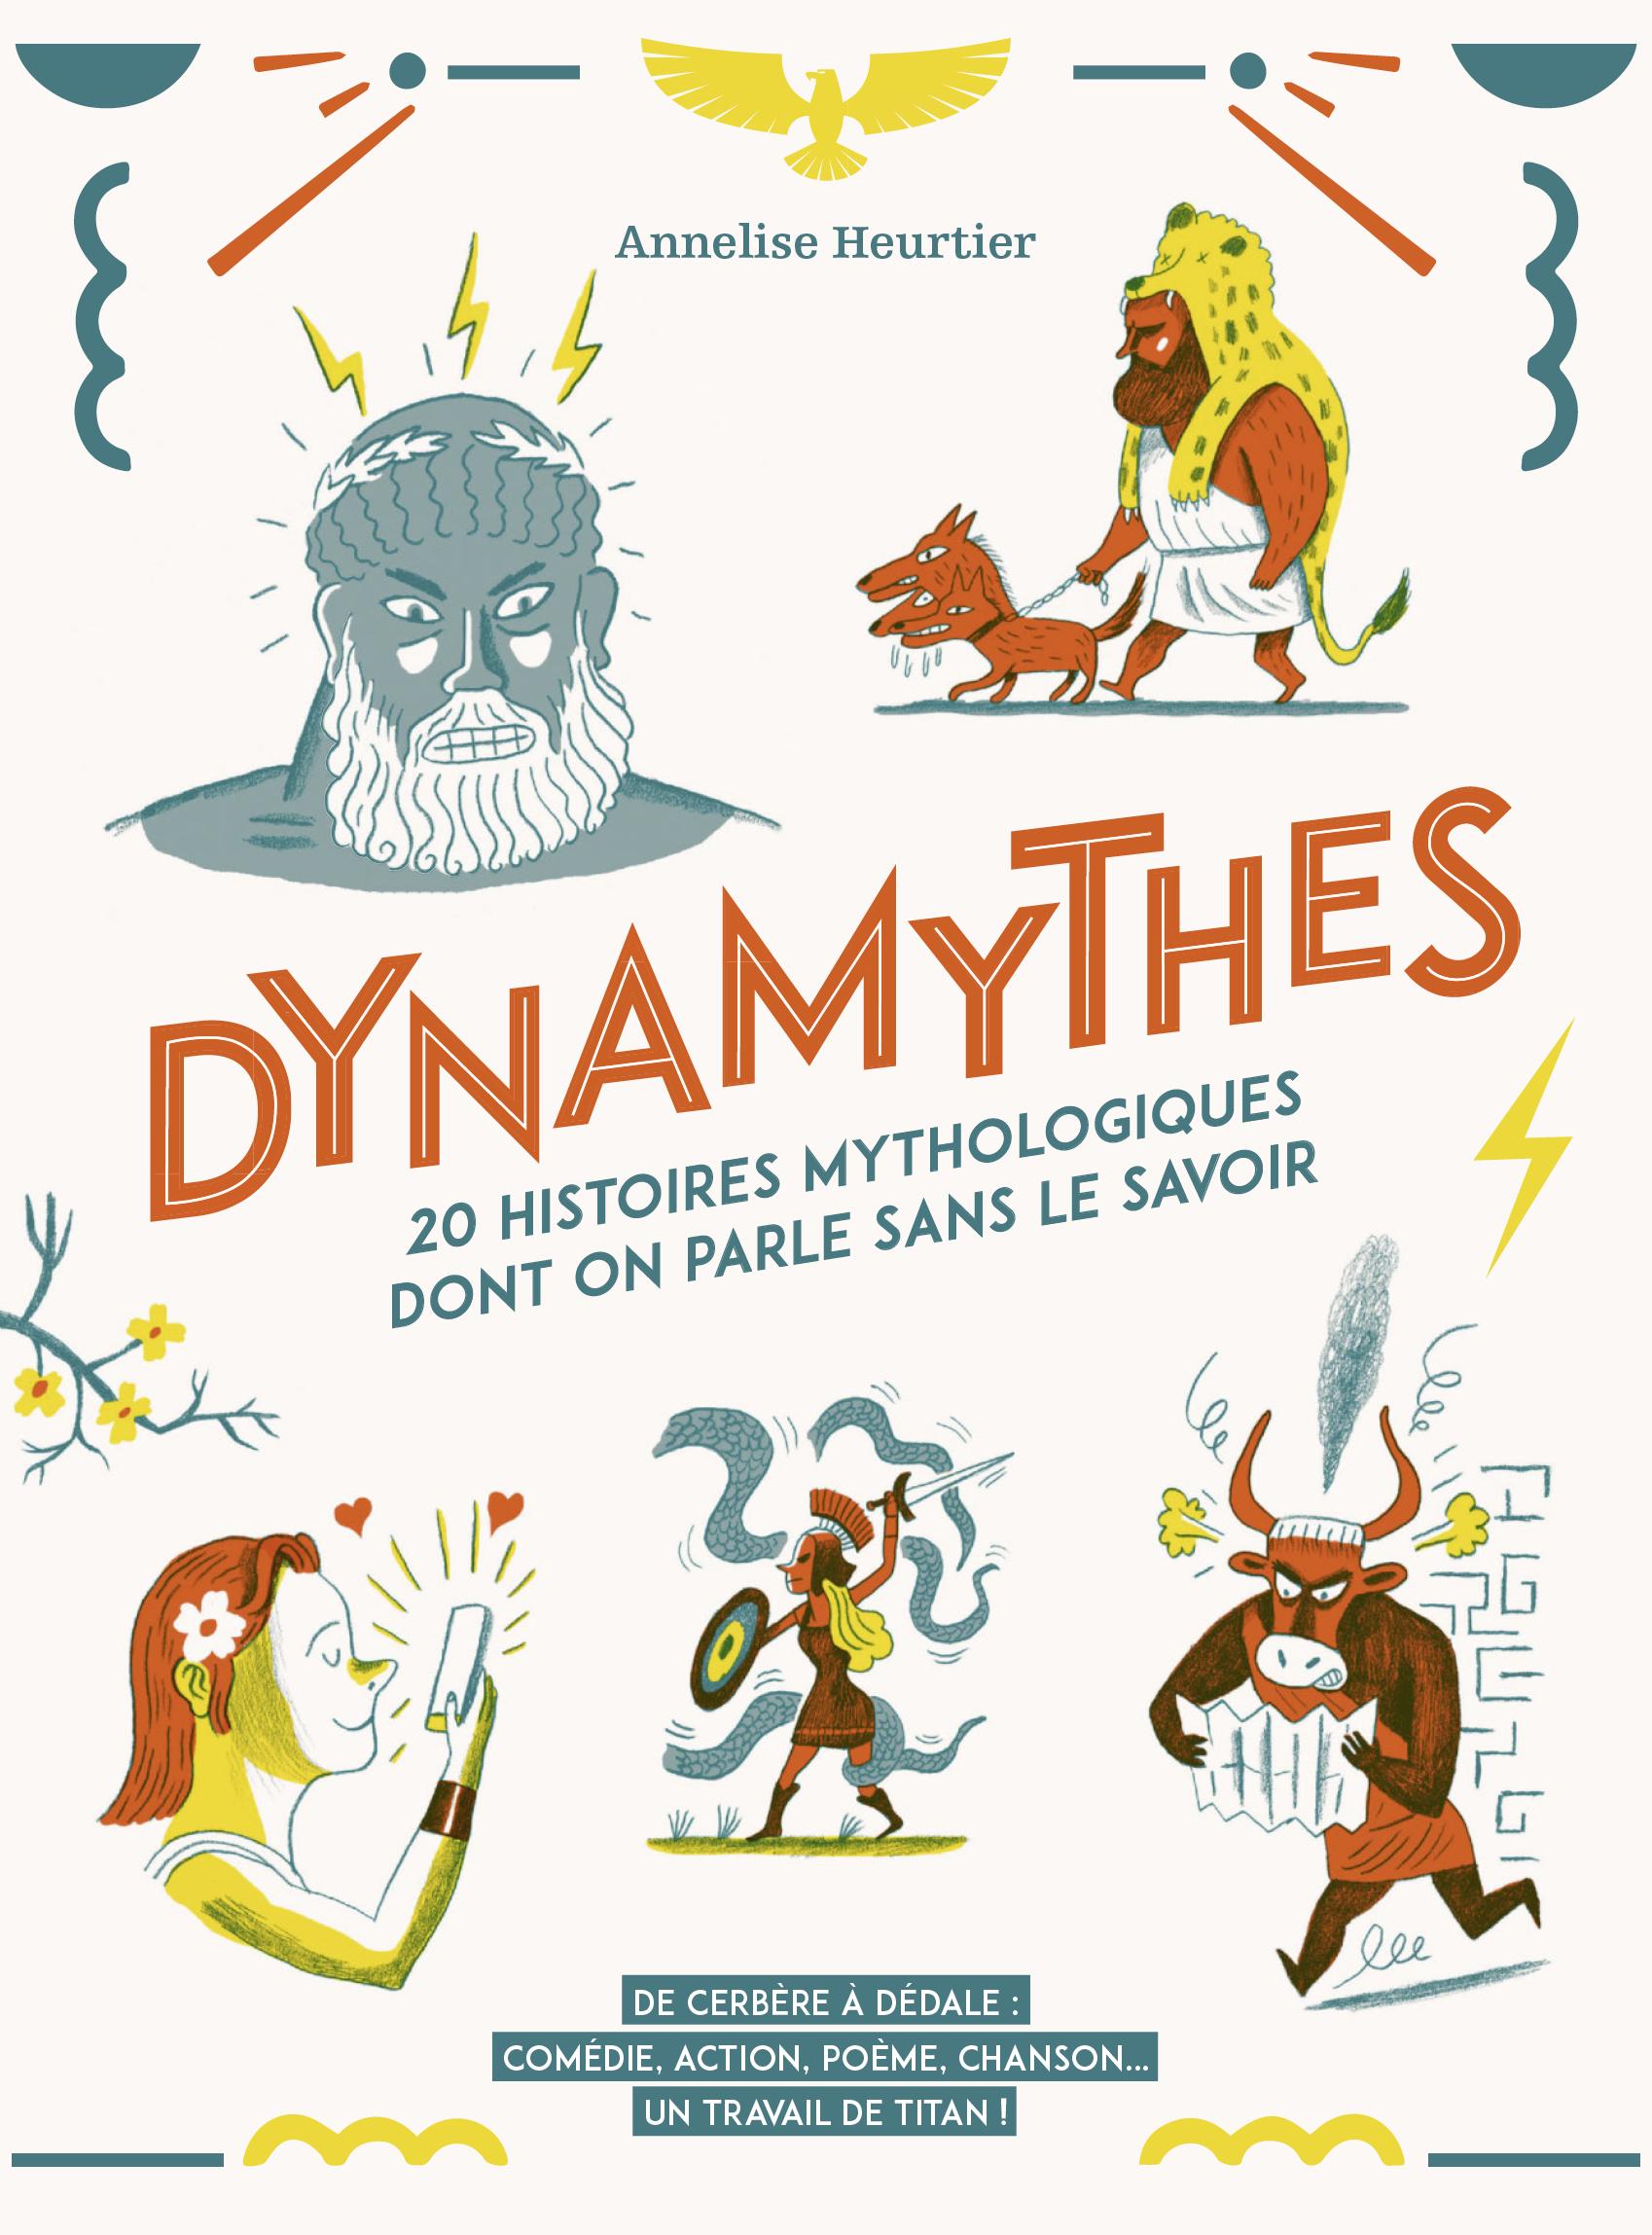 Vignette du livre Dynamythes : vingt histoires mythologiques dont on parle...